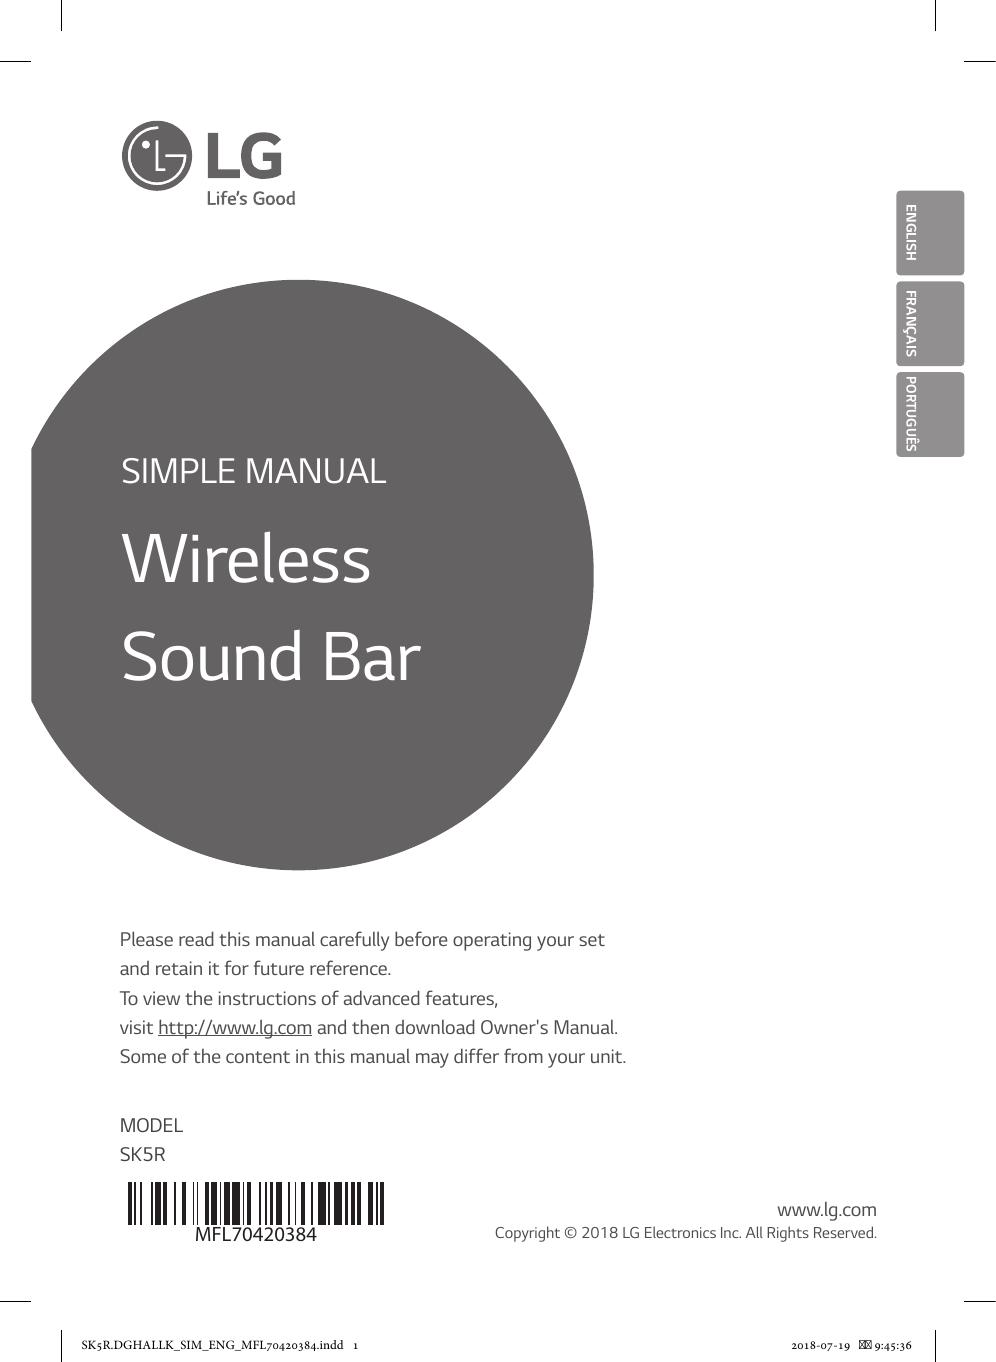 LG SK5R Owner's manual | manualzz com